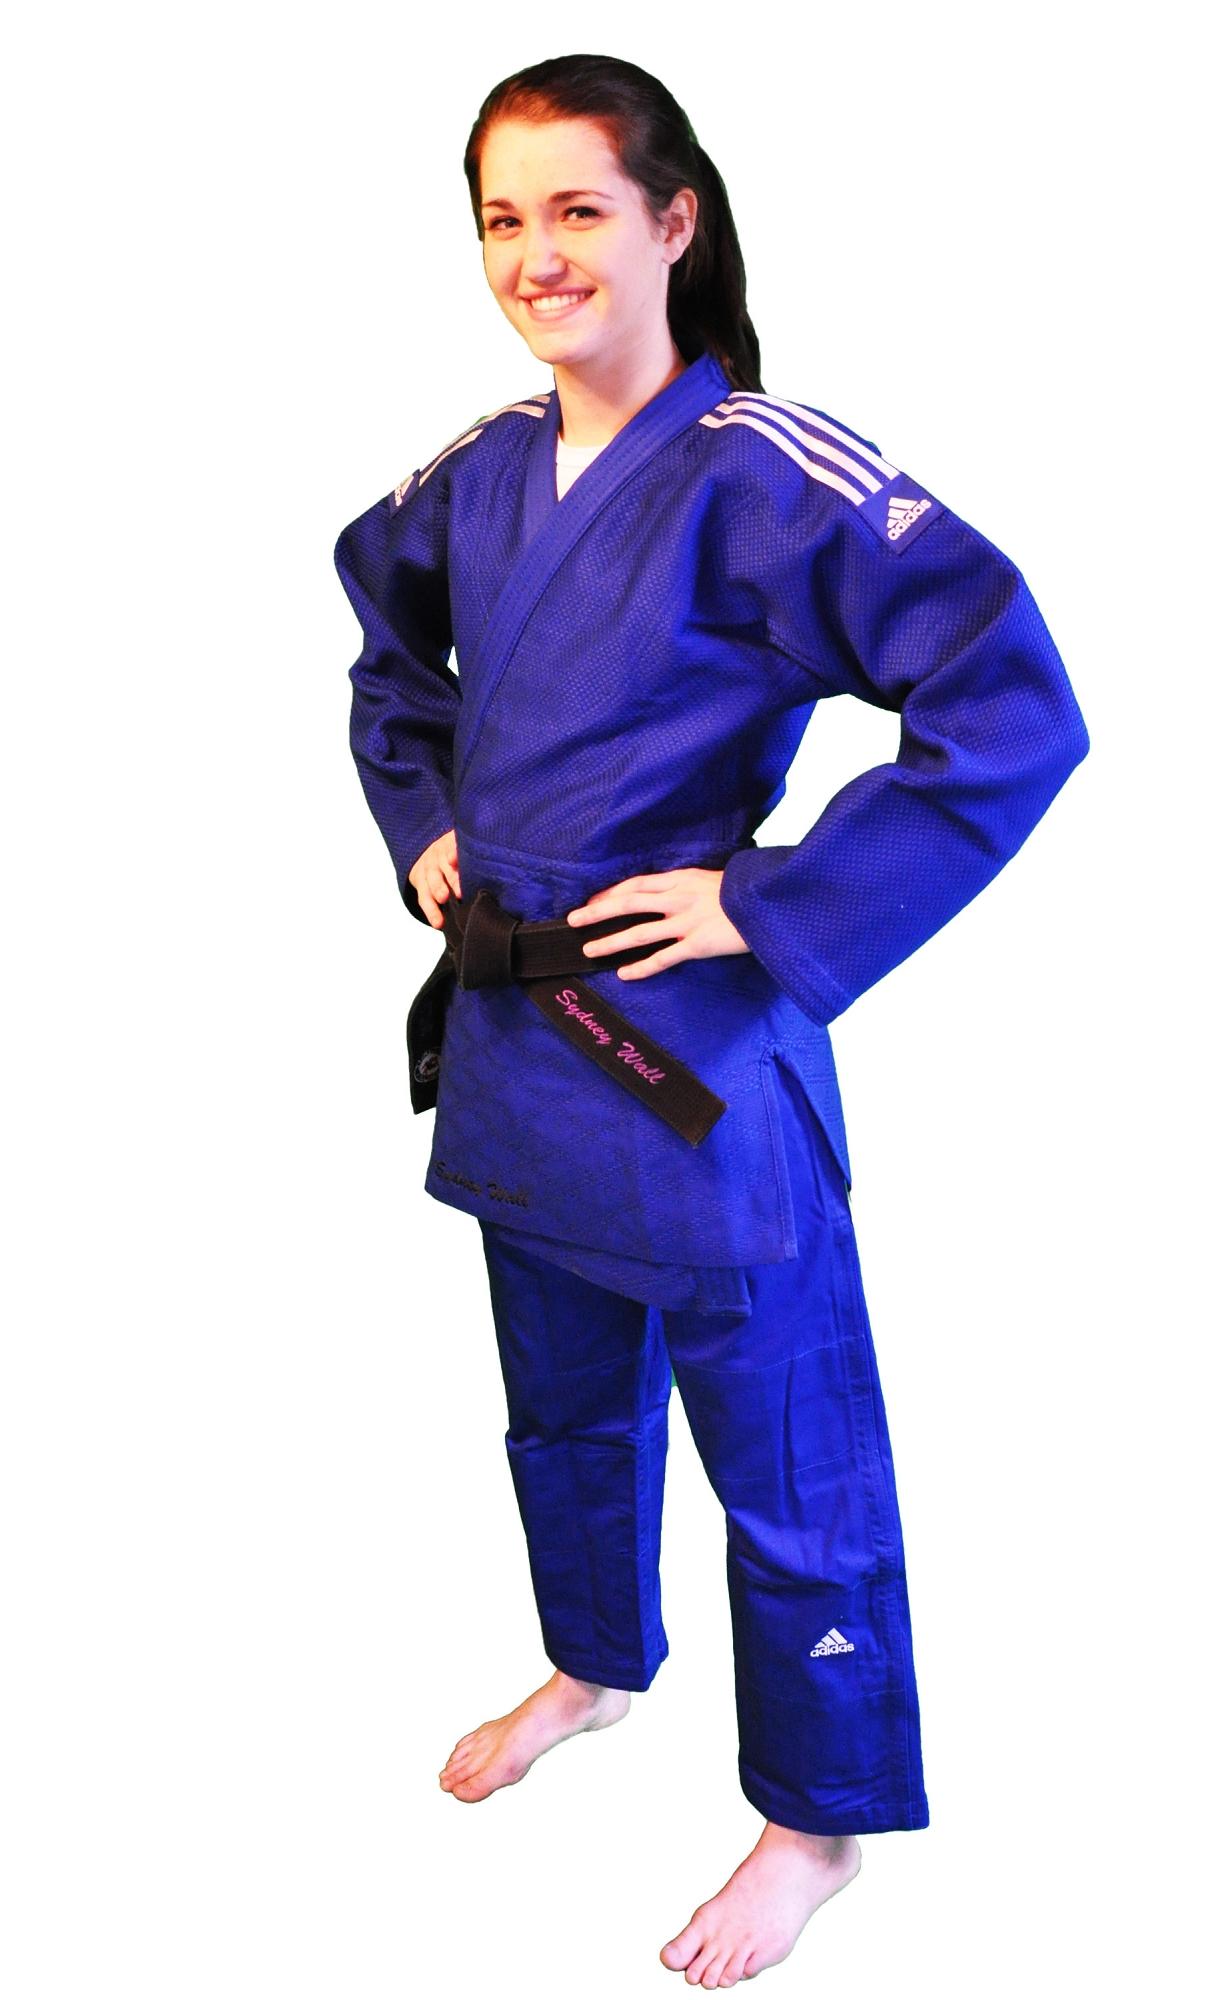 3942f8d238304 adidas Champion 2 IJF Judo Gi